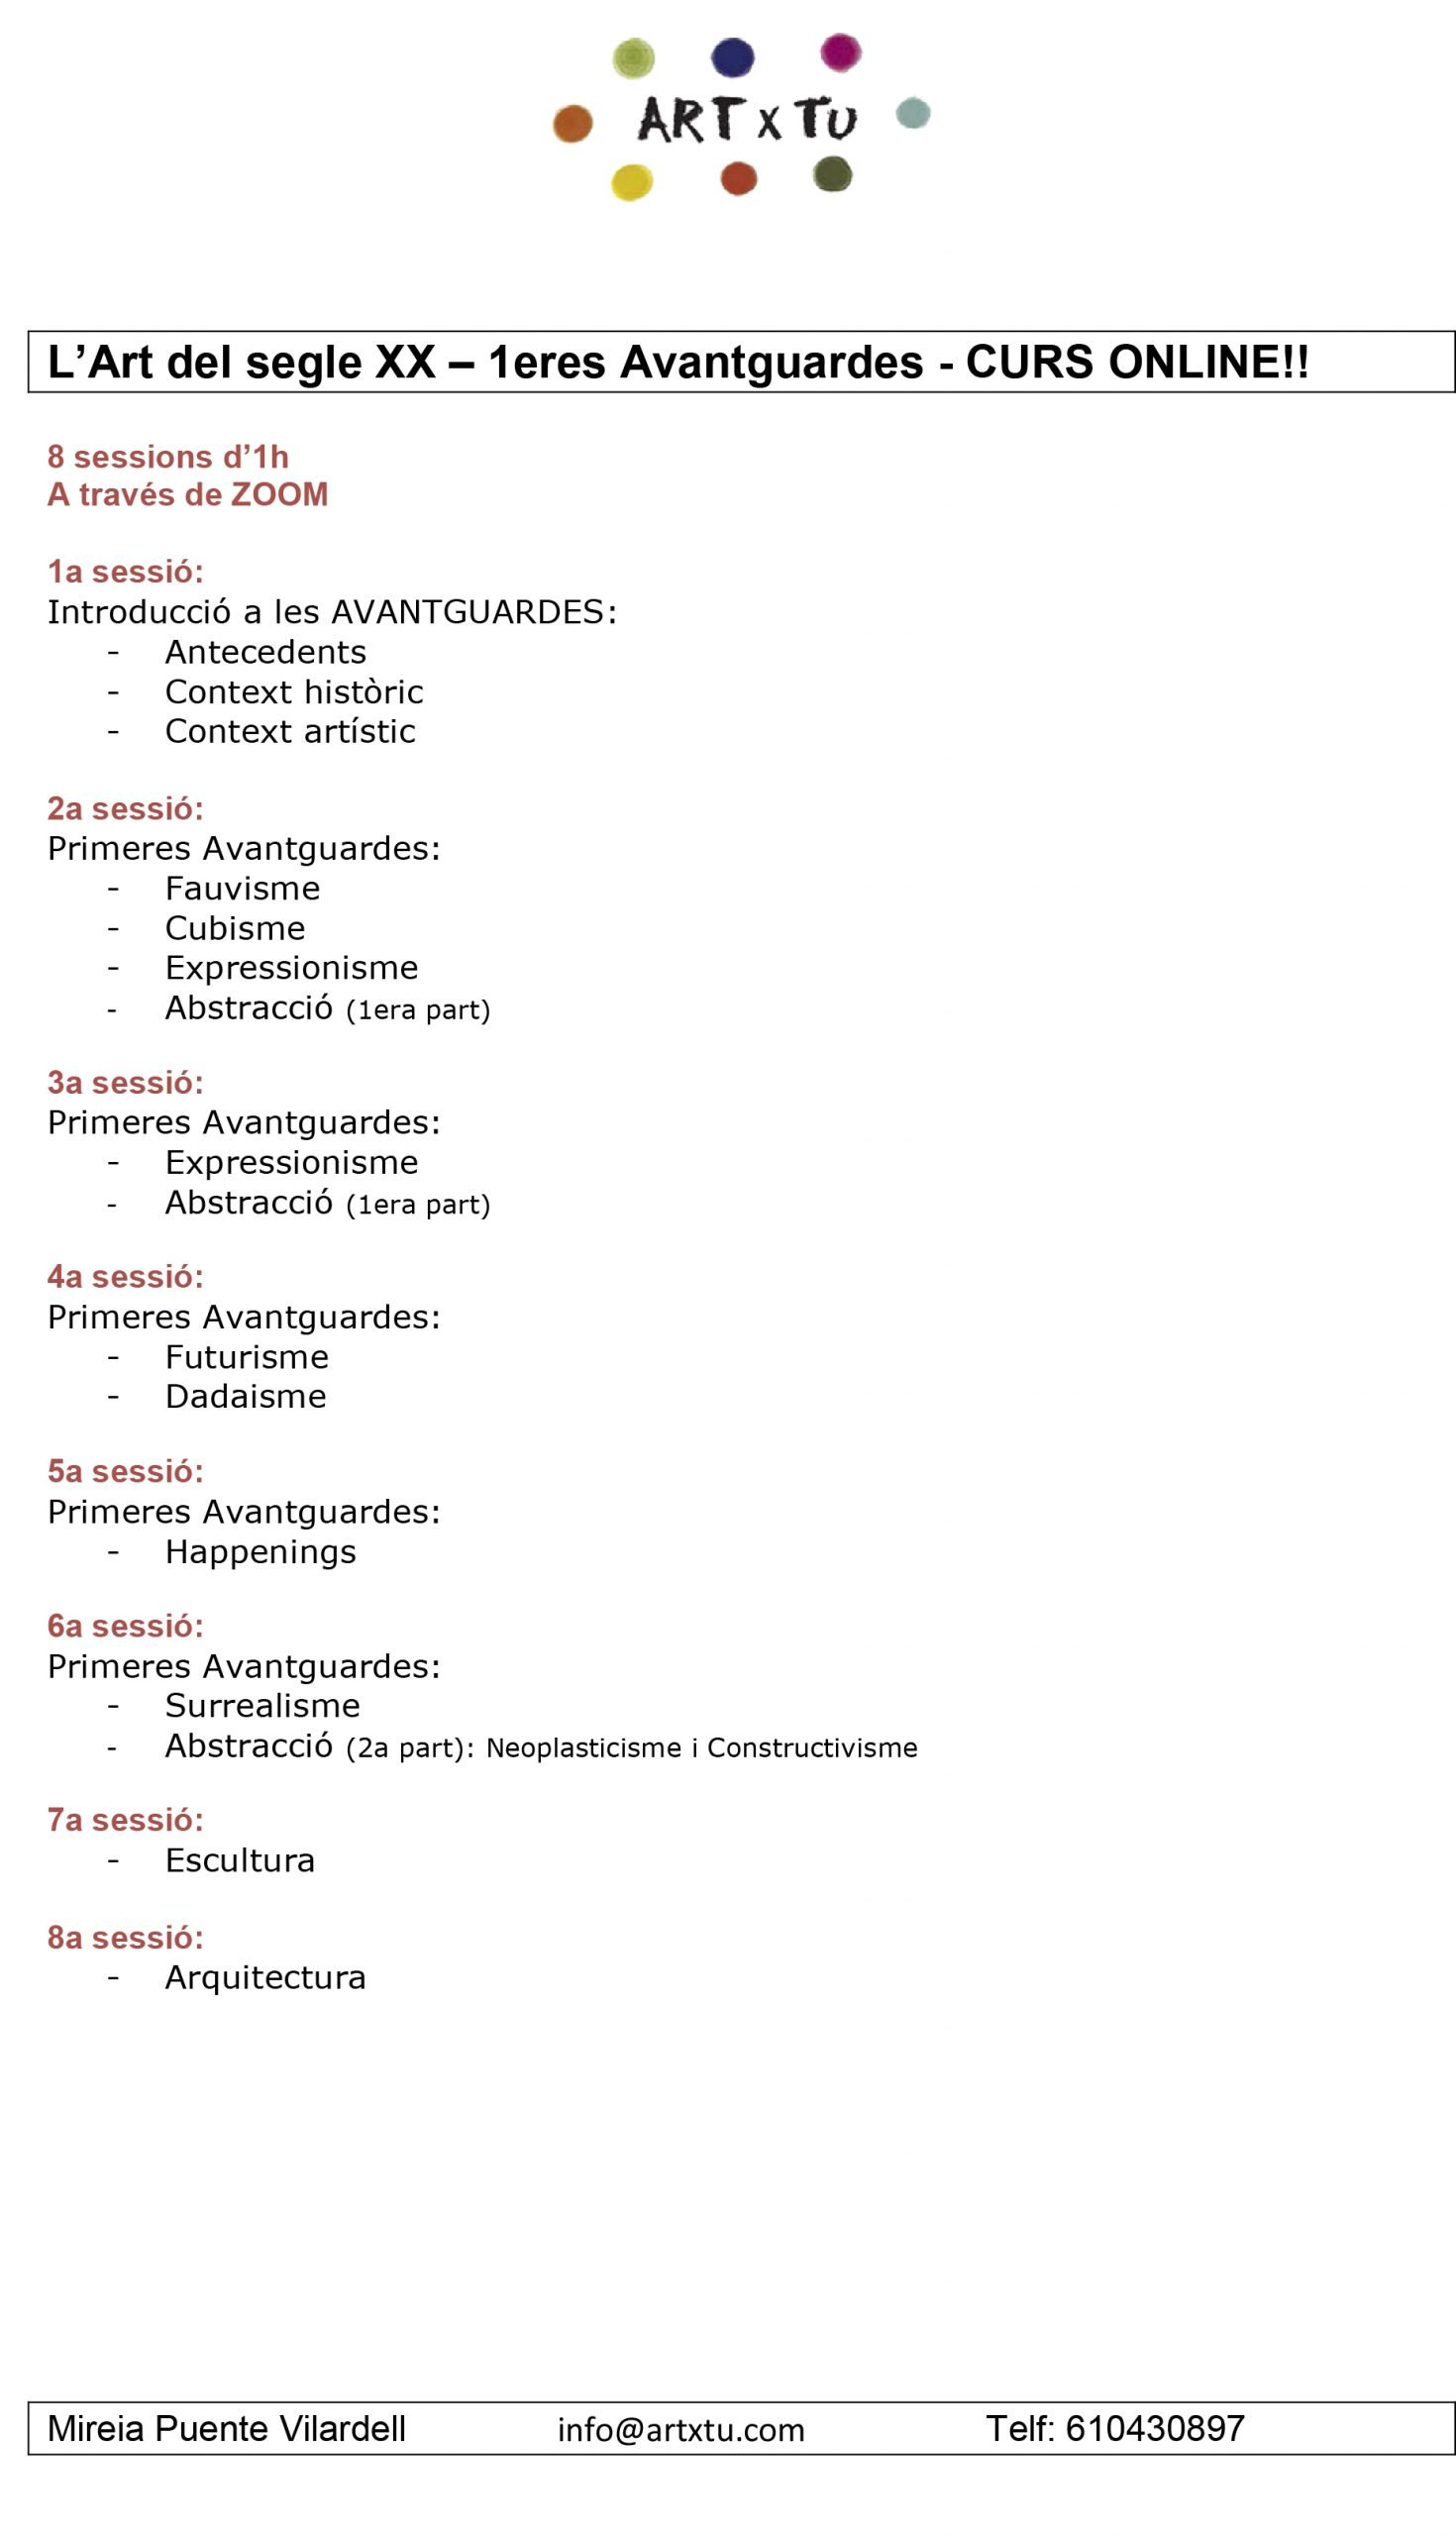 Programa-Art-del-segle-XX-1eres-Avantguardes-scaled Formació